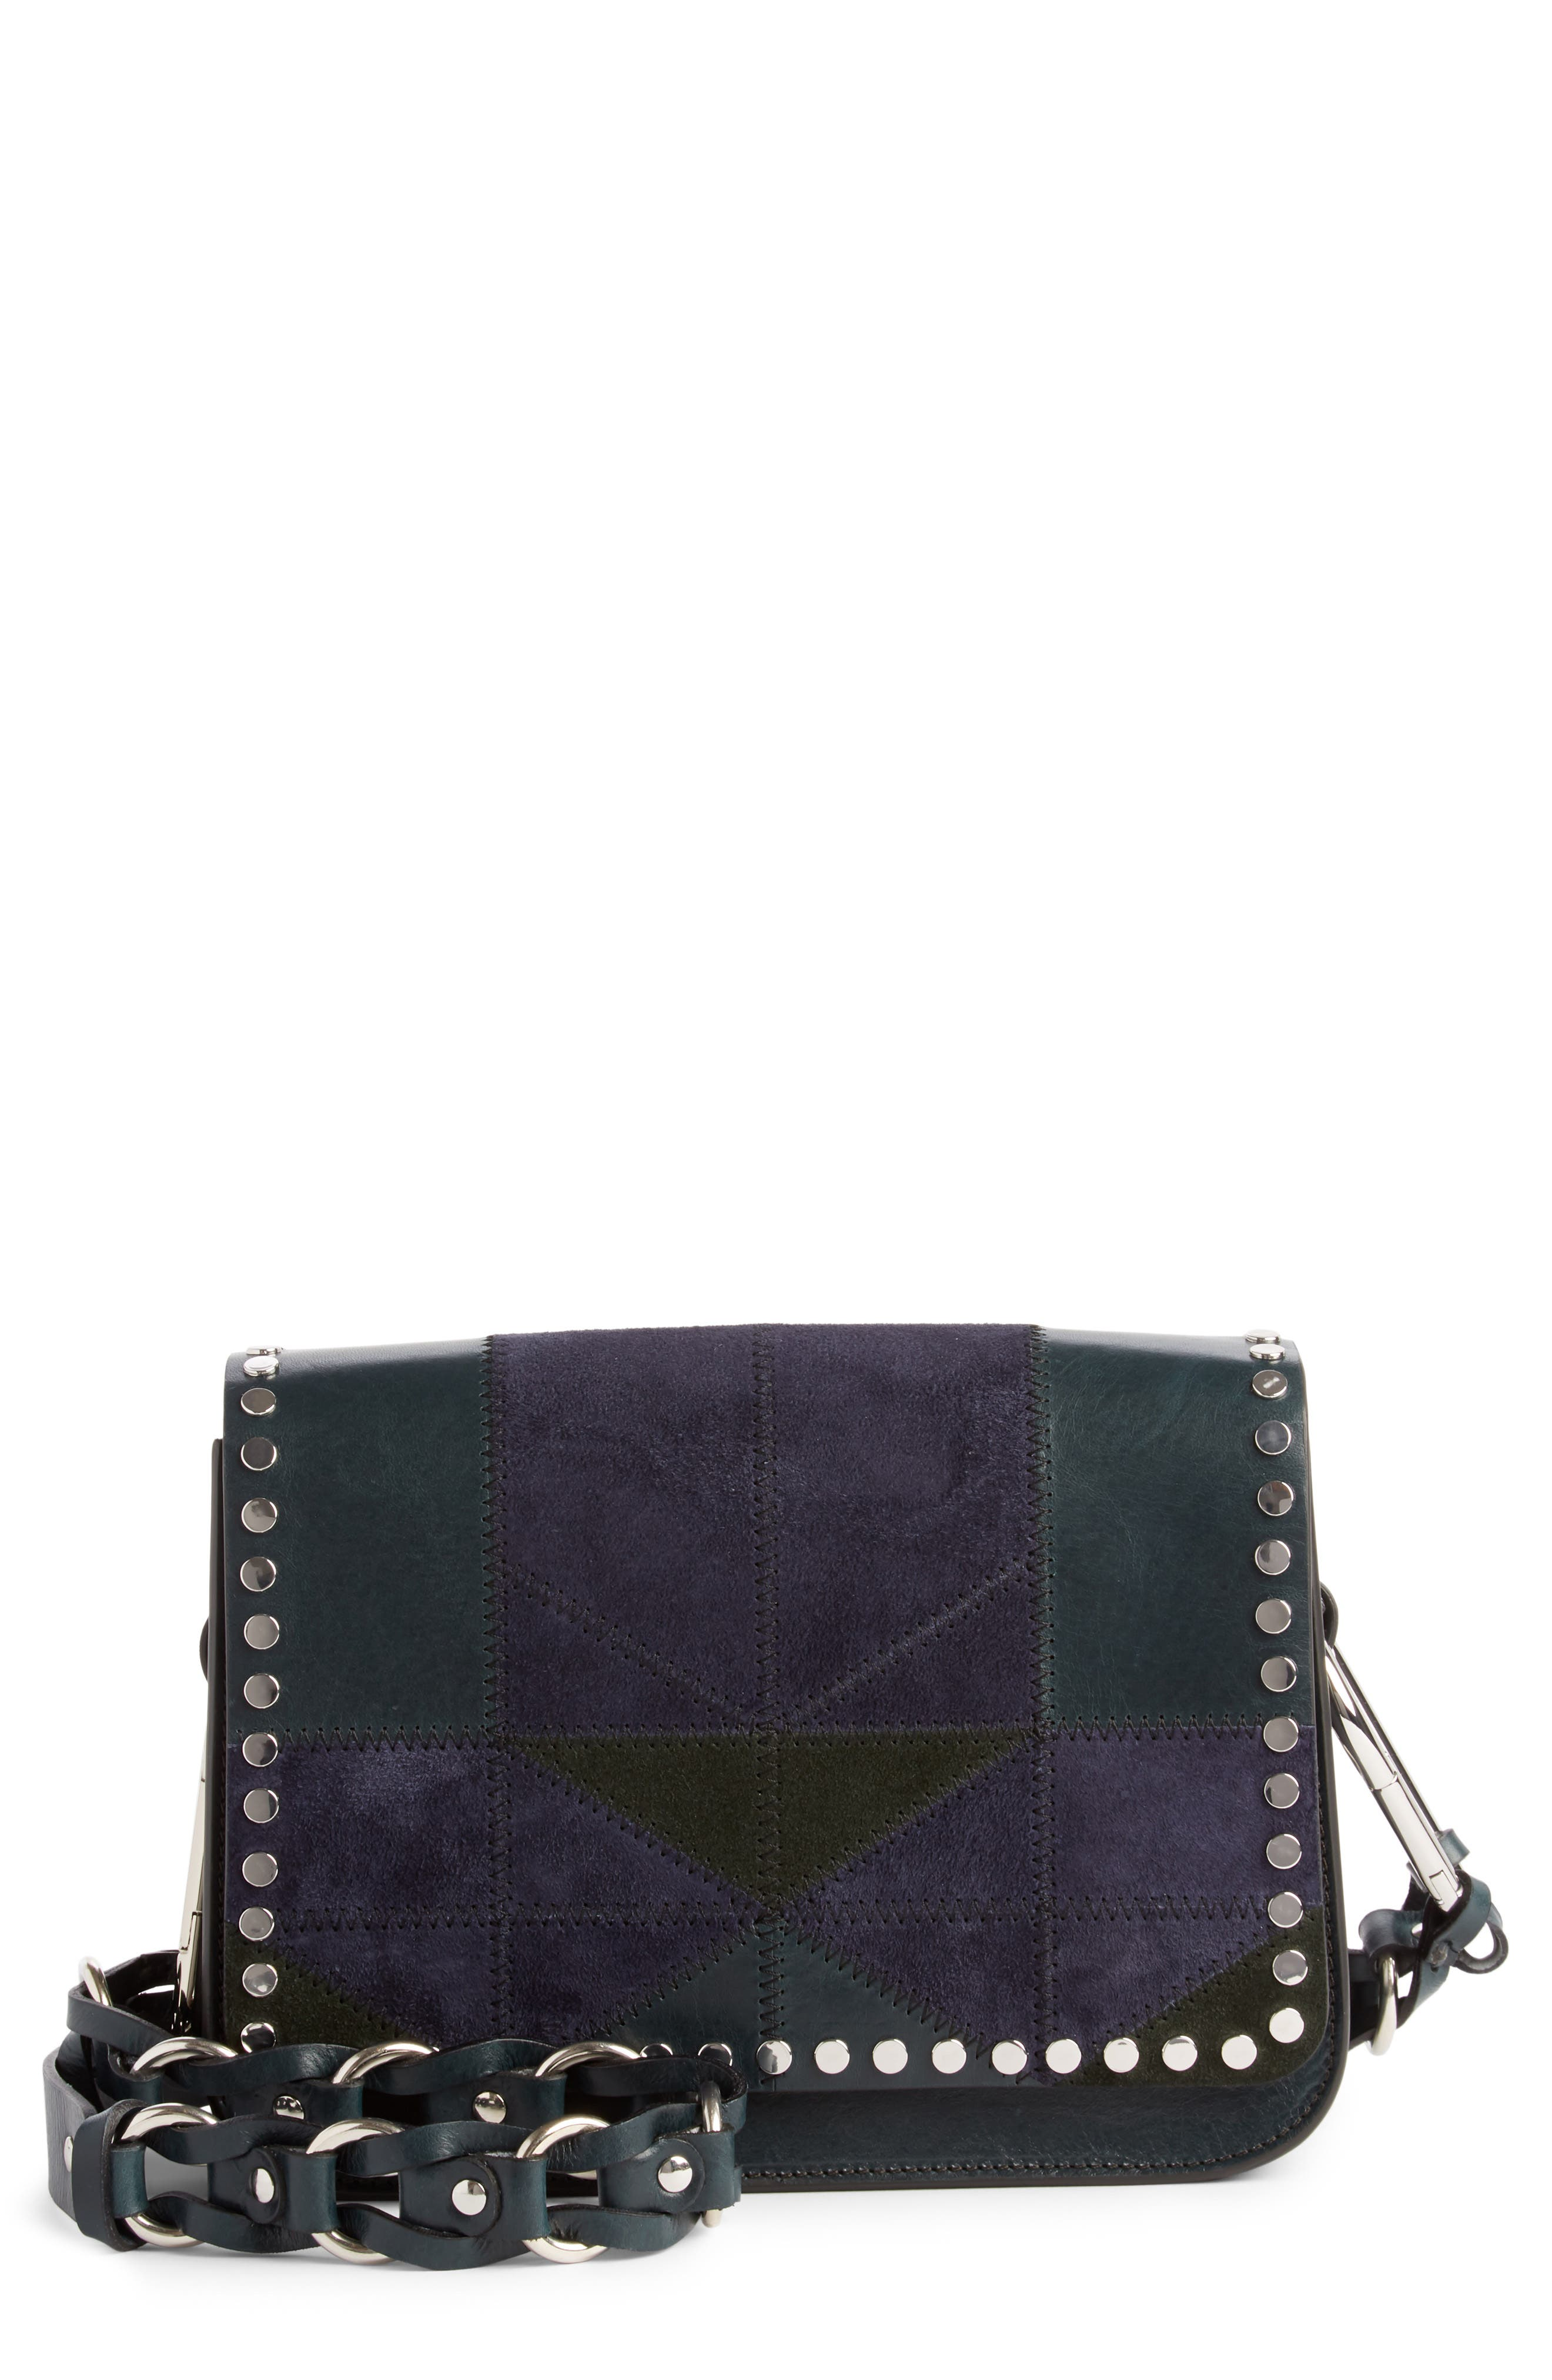 Calibar Patchwork Leather Crossbody Bag,                         Main,                         color,